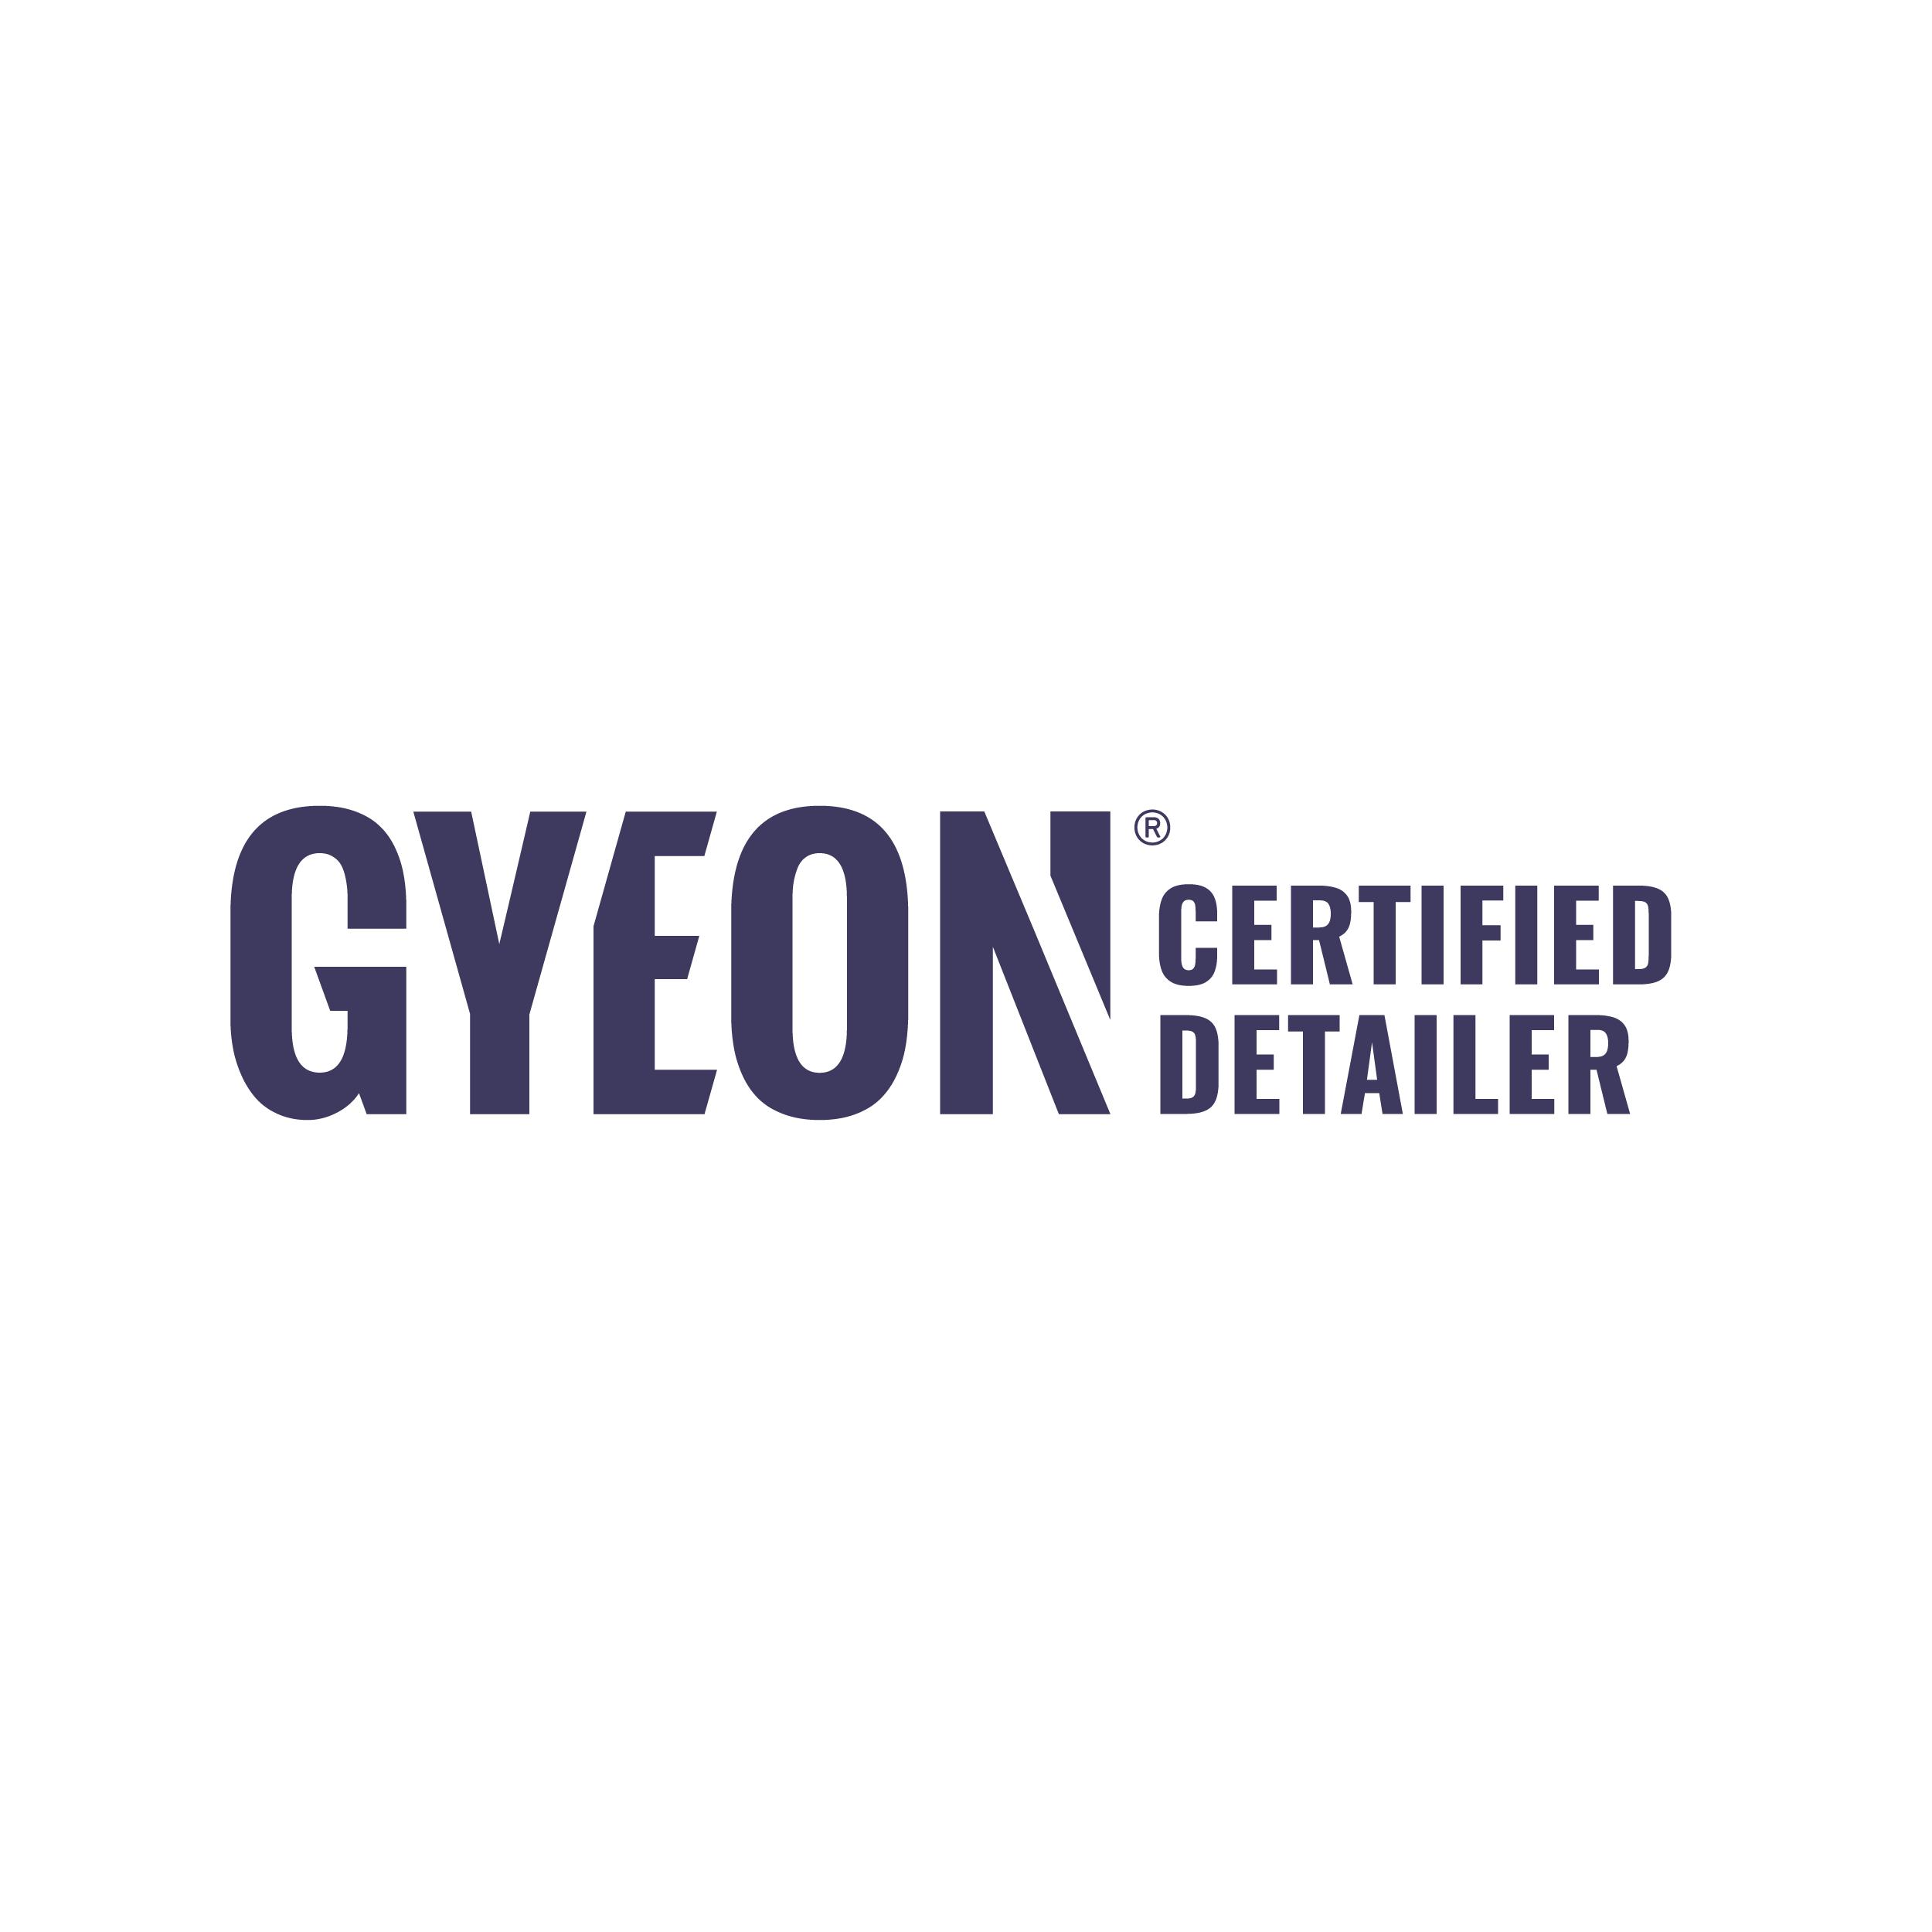 GYEON_certnew_logo_2020-01